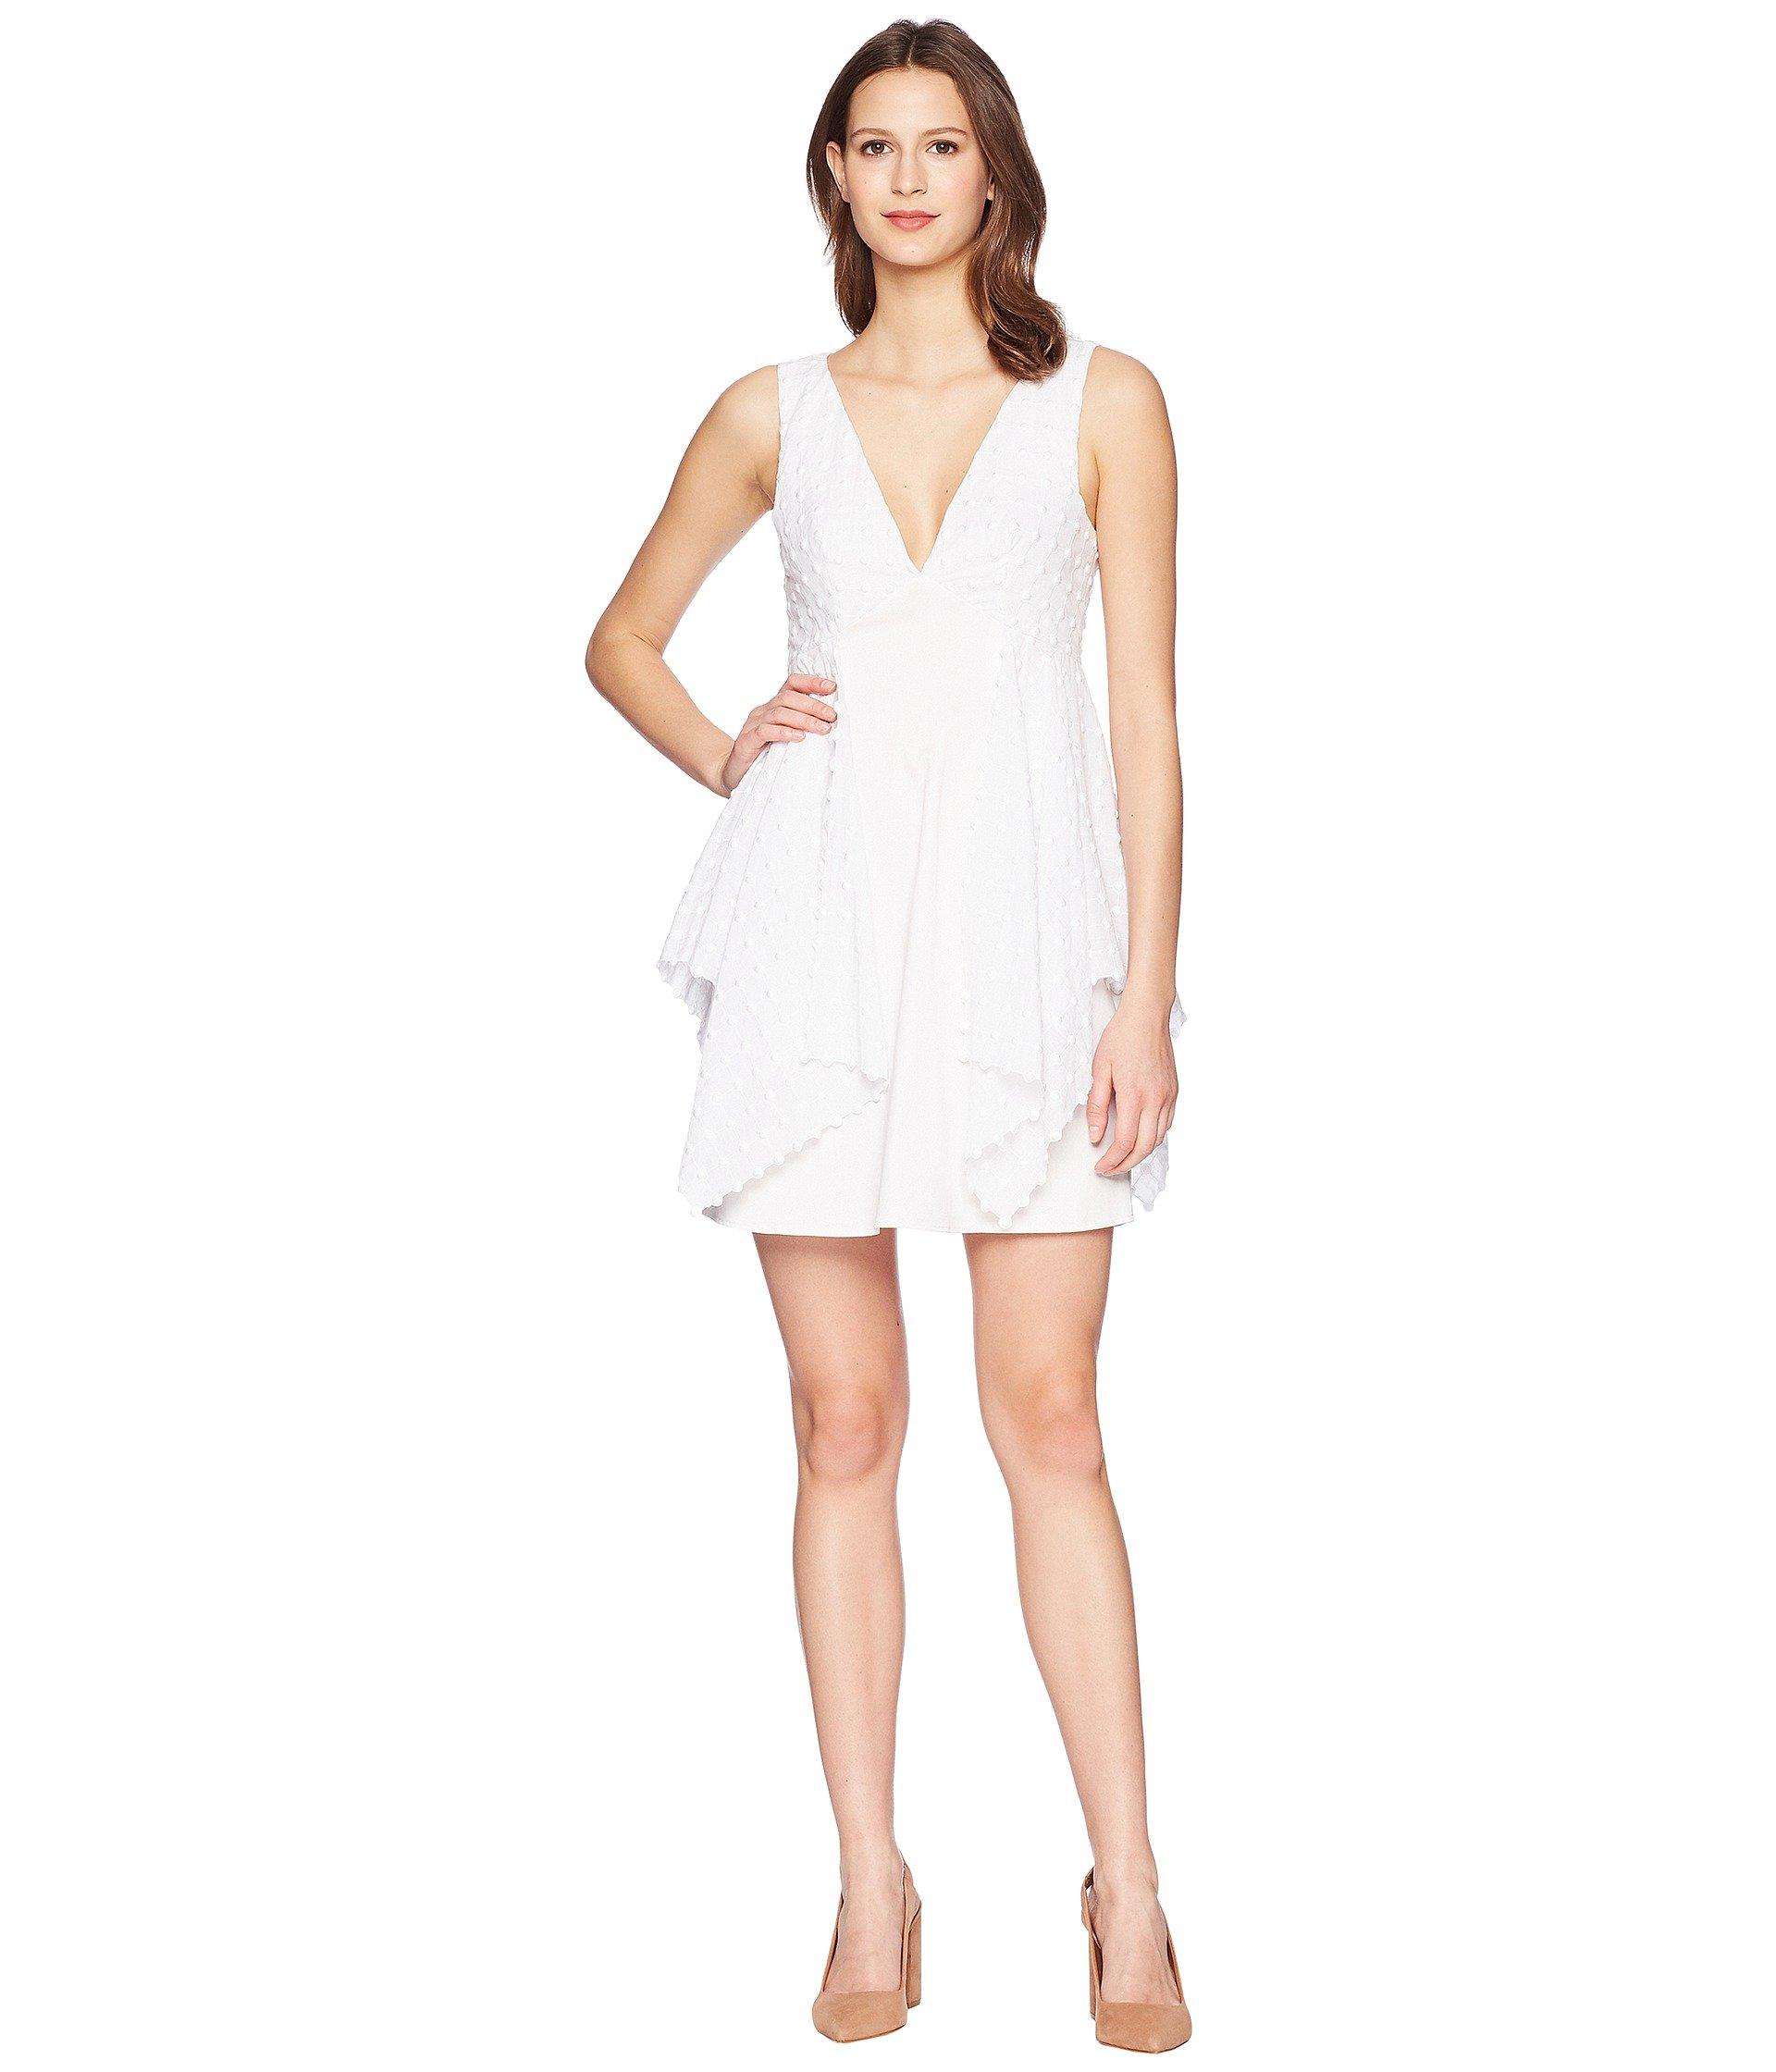 Vestido para Mujer ZAC Zac Posen Prim Dress  + ZAC Zac Posen en VeoyCompro.net